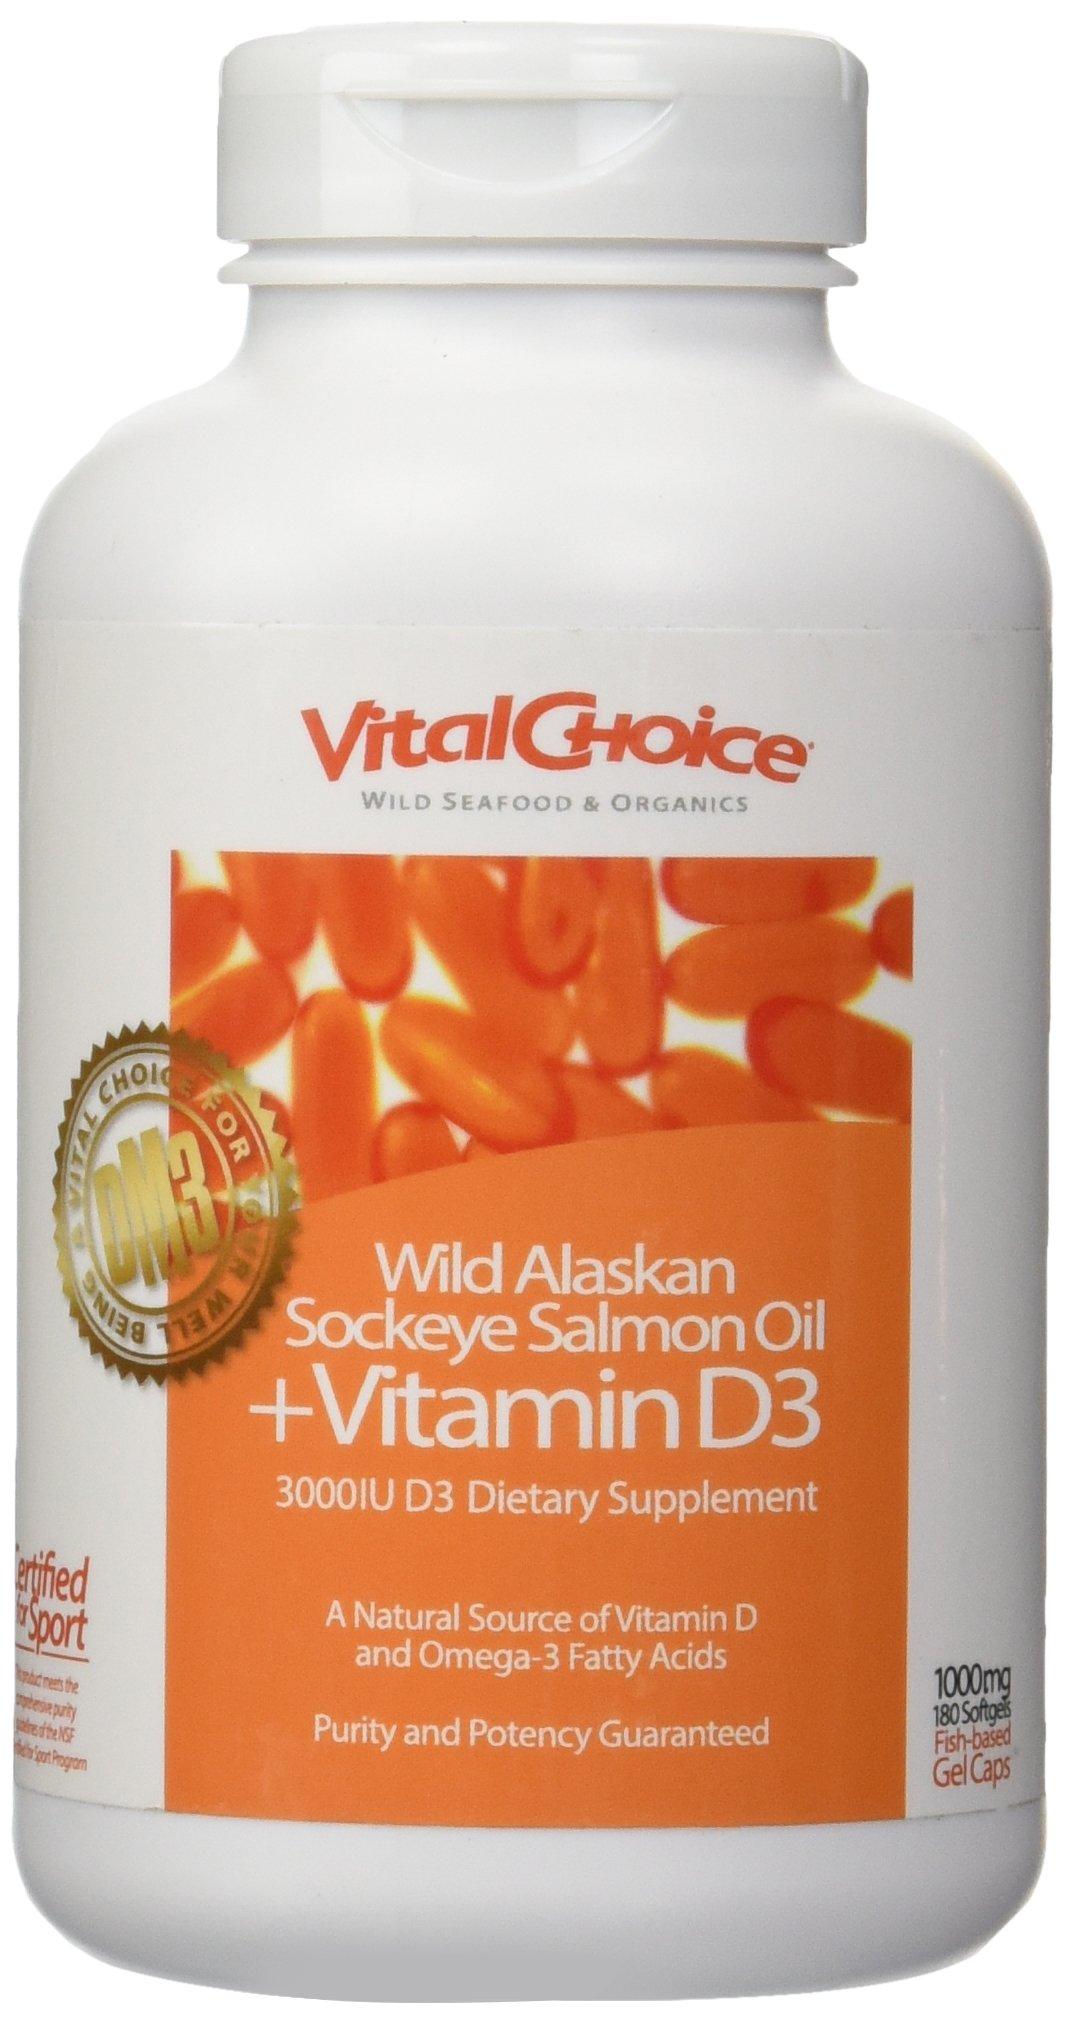 Vital Choice Wild Alaskan Sockeye Salmon Oil with Vitamin D3, 3000 I.U., 1000mg, 180-Count by Vital Choice